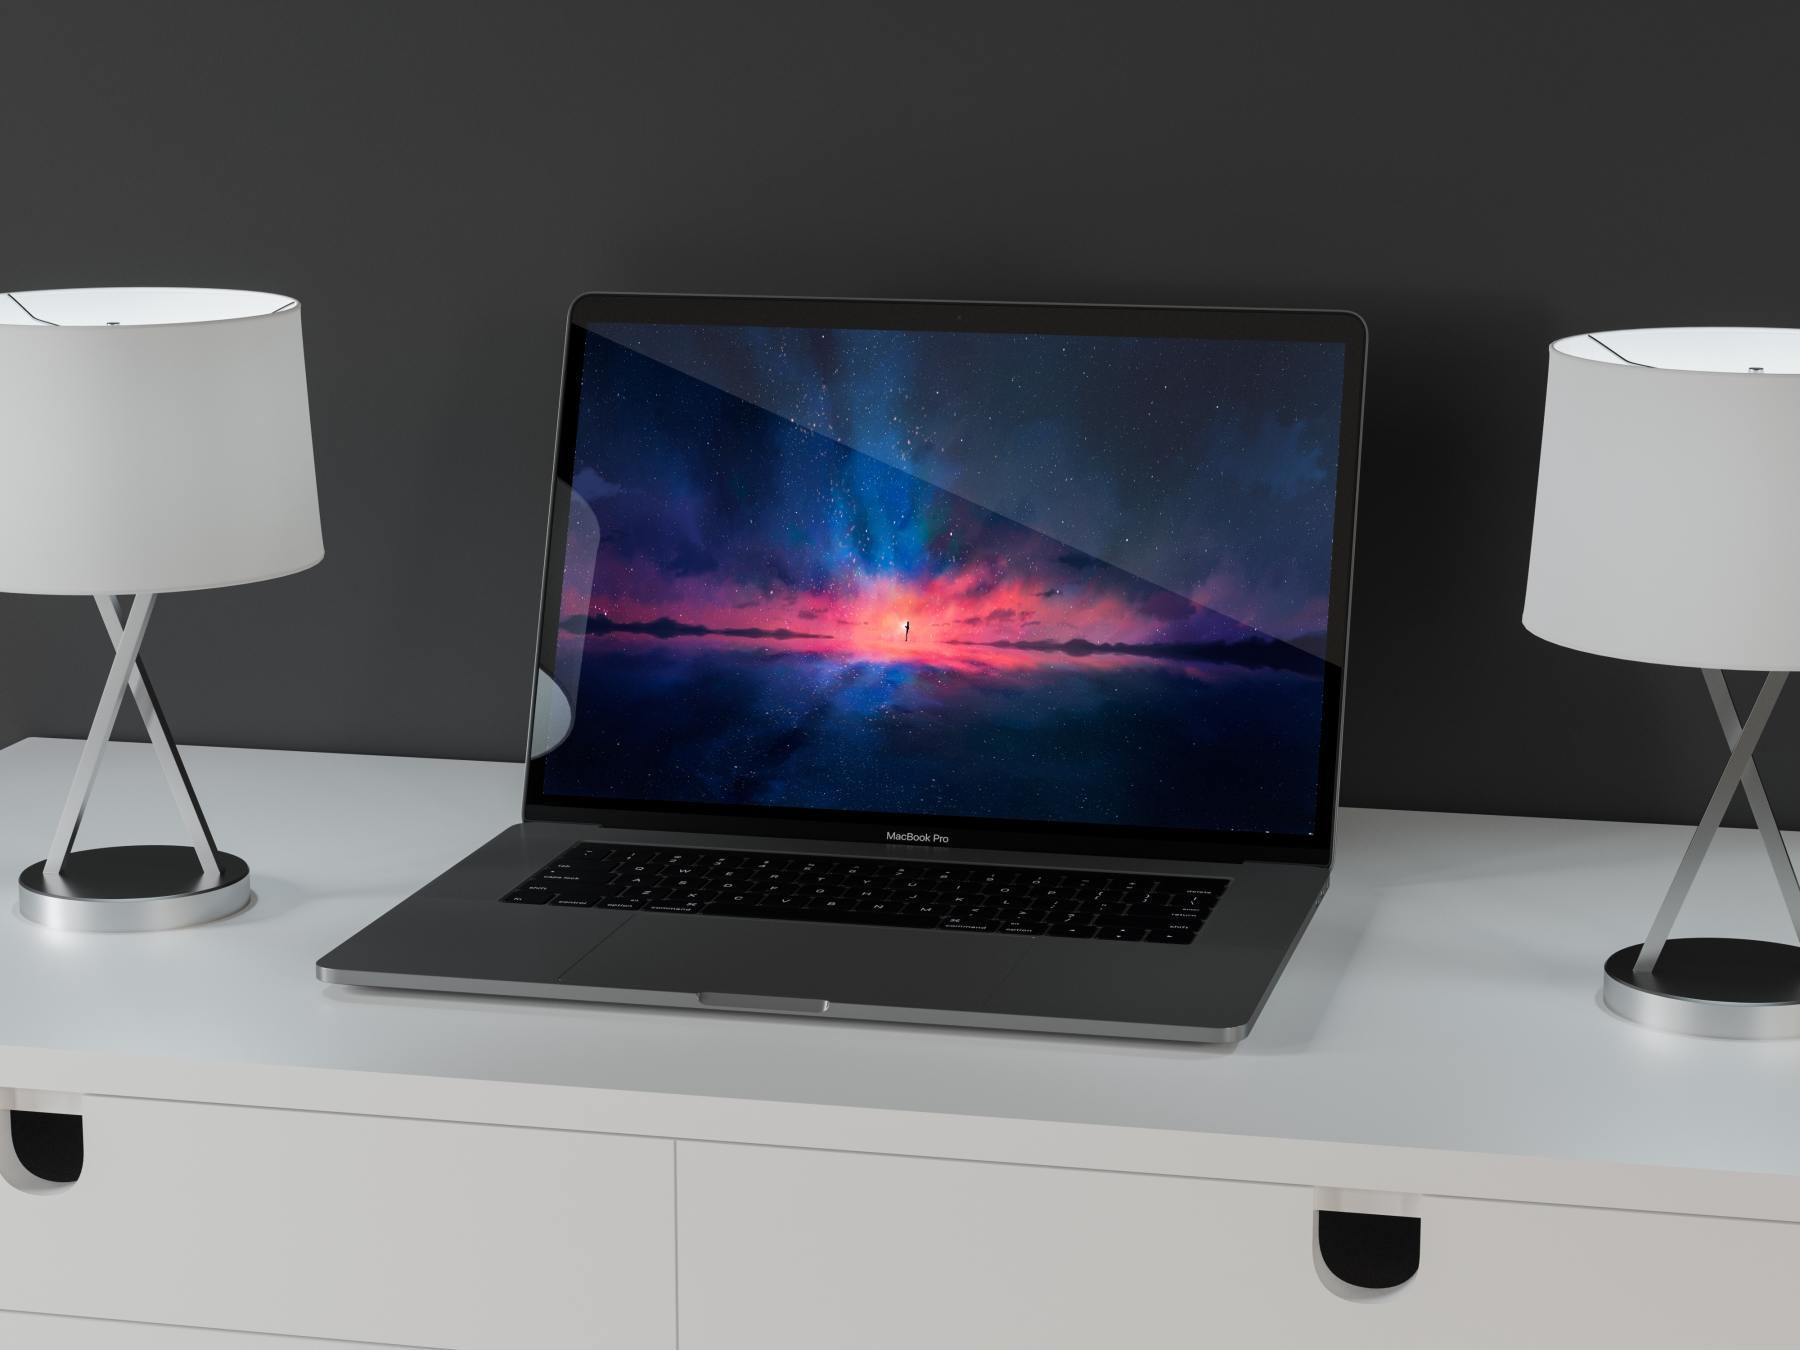 1569727638 ec4e95d731415d1 - 苹果Macbook UI样机